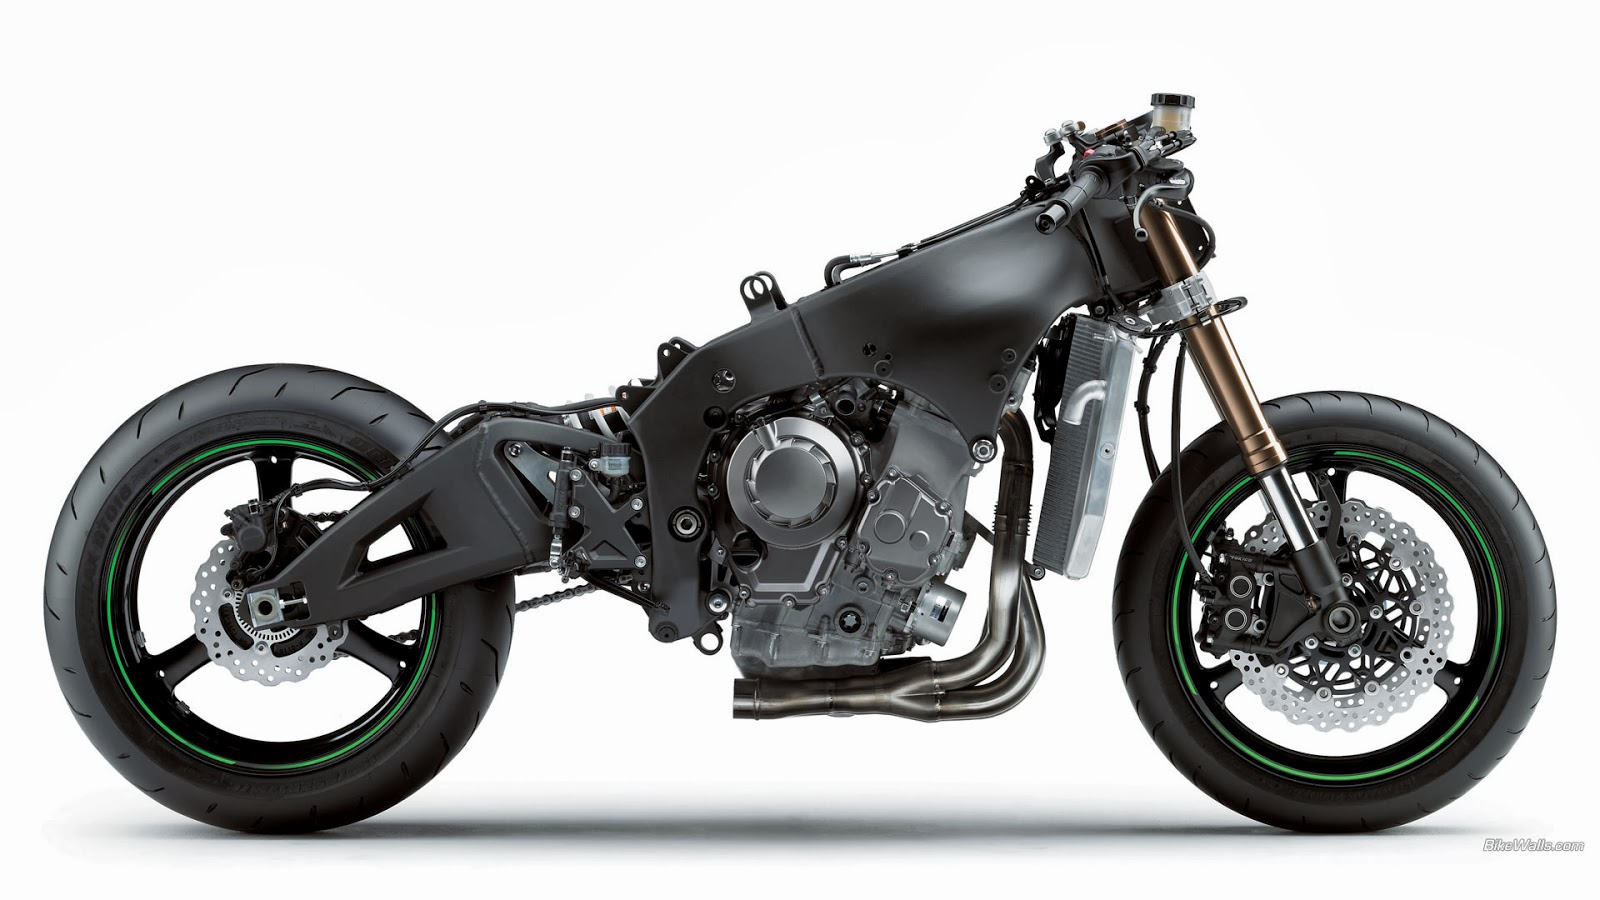 Ninja Cc Modifikasi Motor Kawasaki Ninja Cc Terbaru